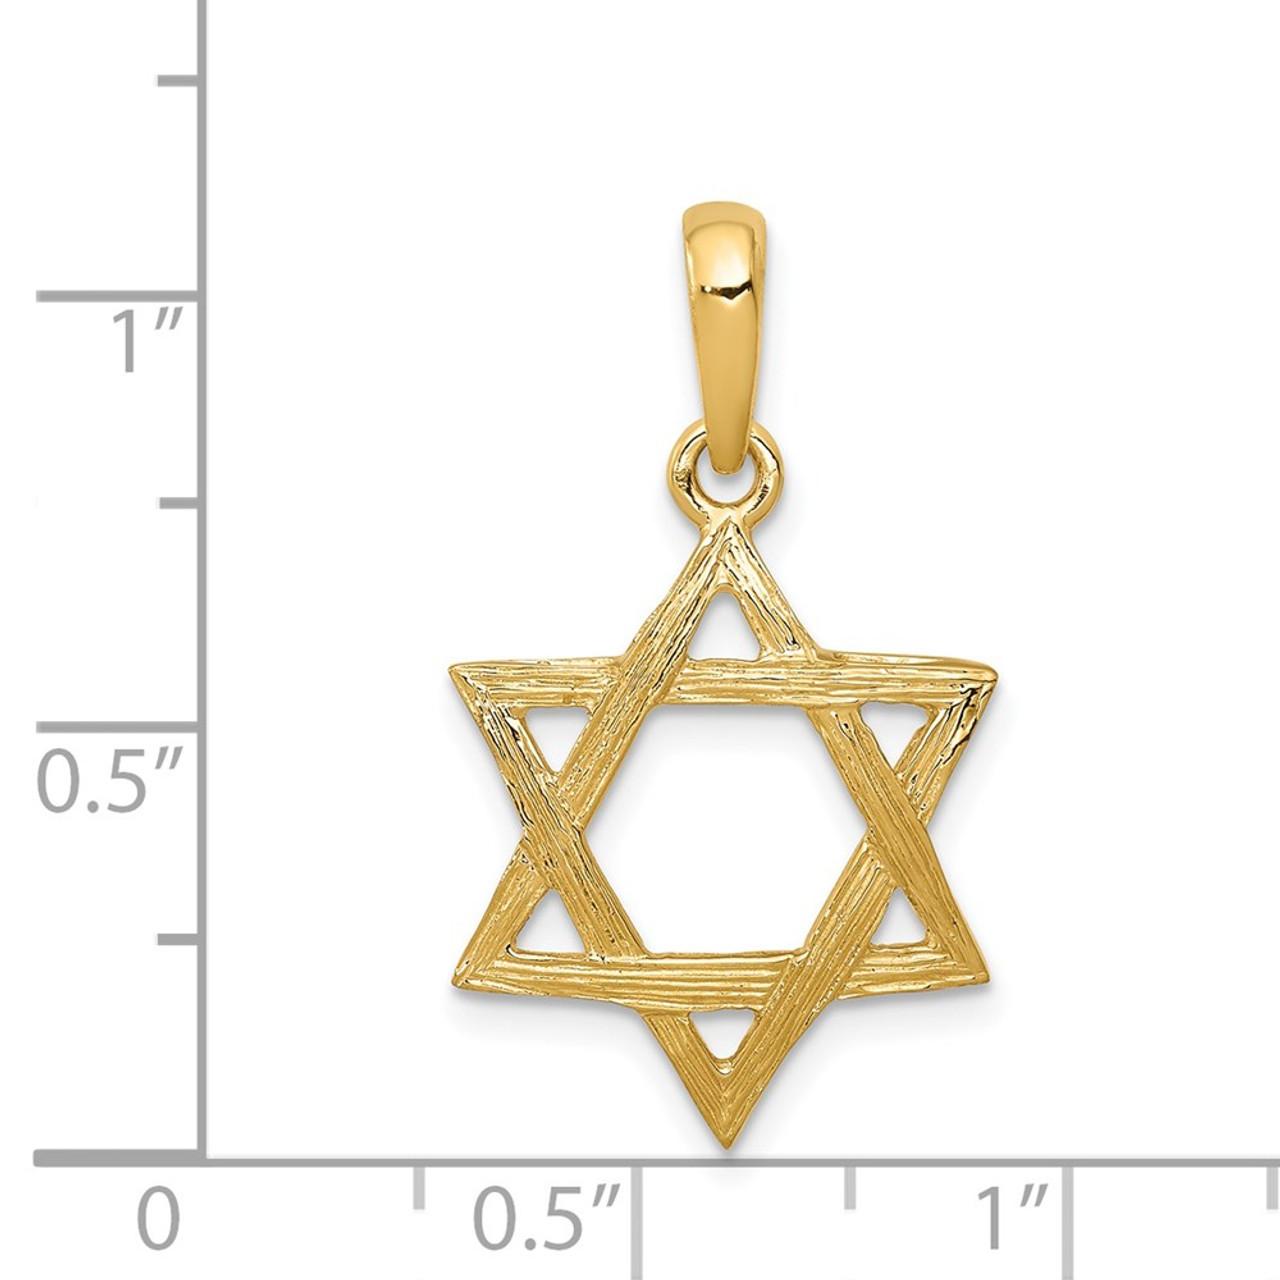 14k Yellow Gold Star of David CZ Pendant Size : 21 x 15 mm